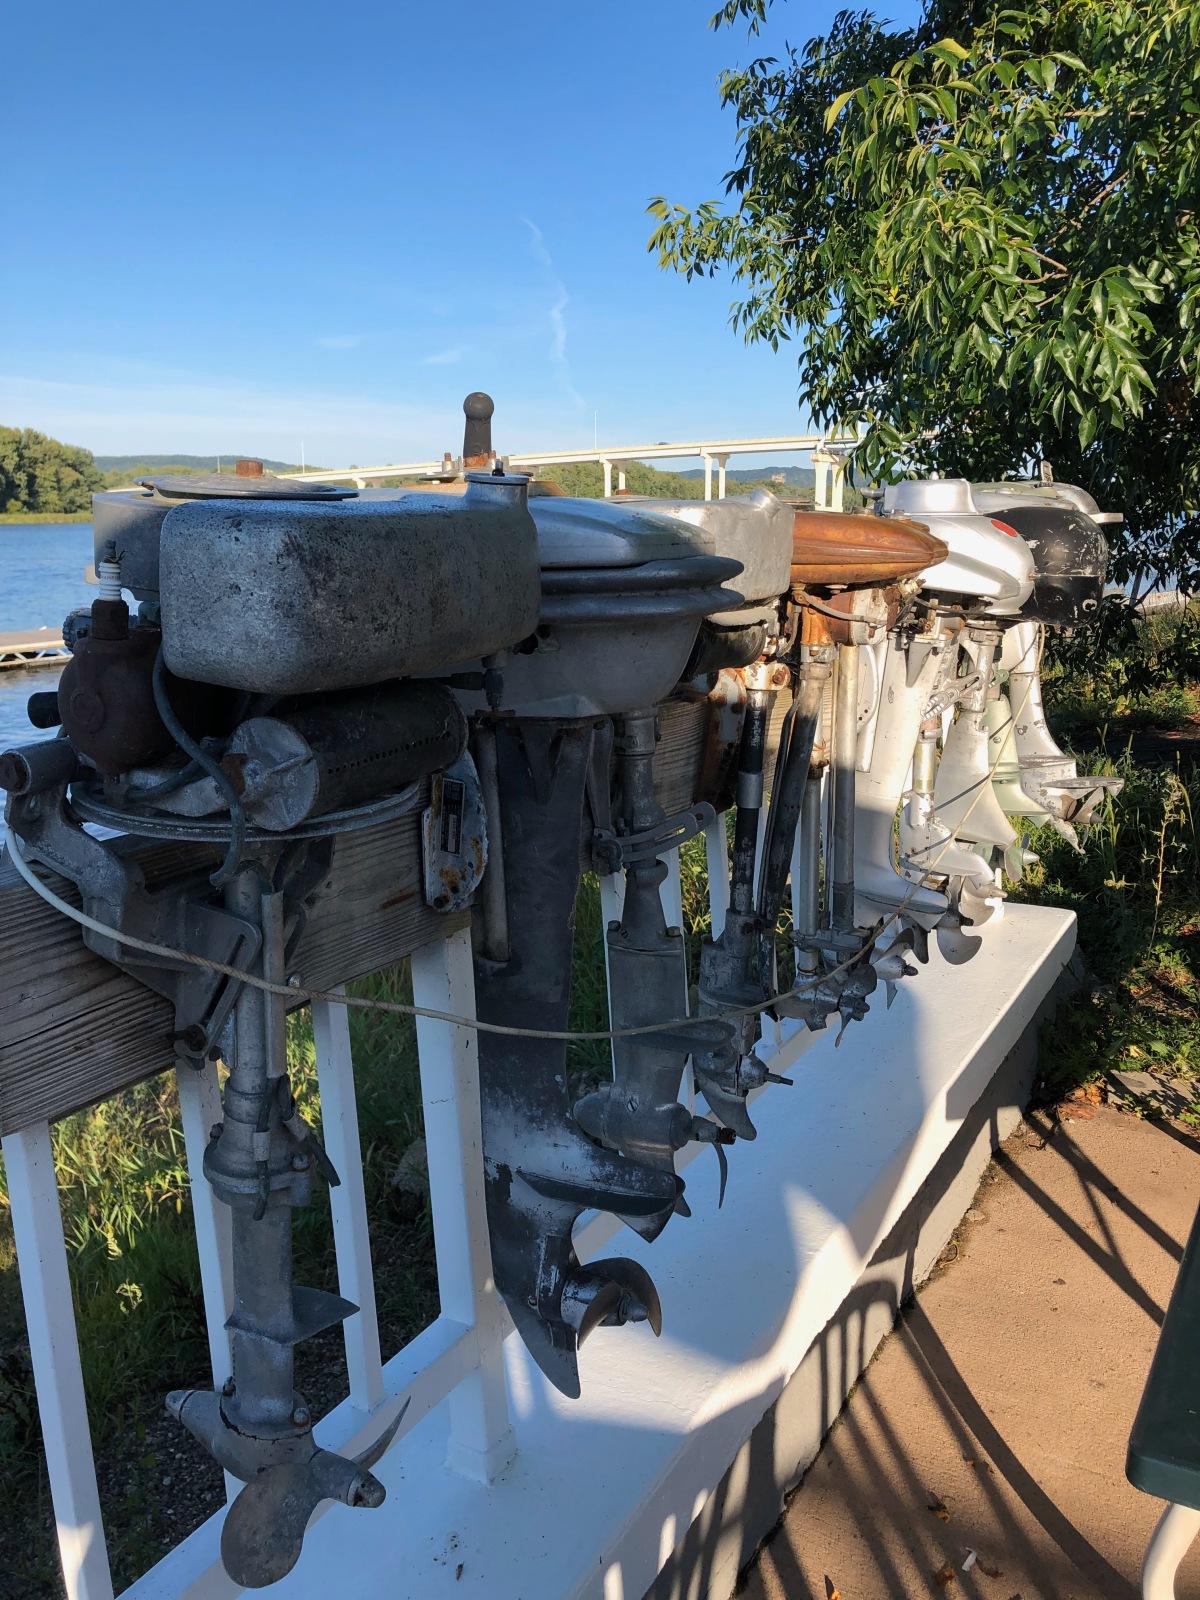 A true Minnesota piece of artwork- outboard motors